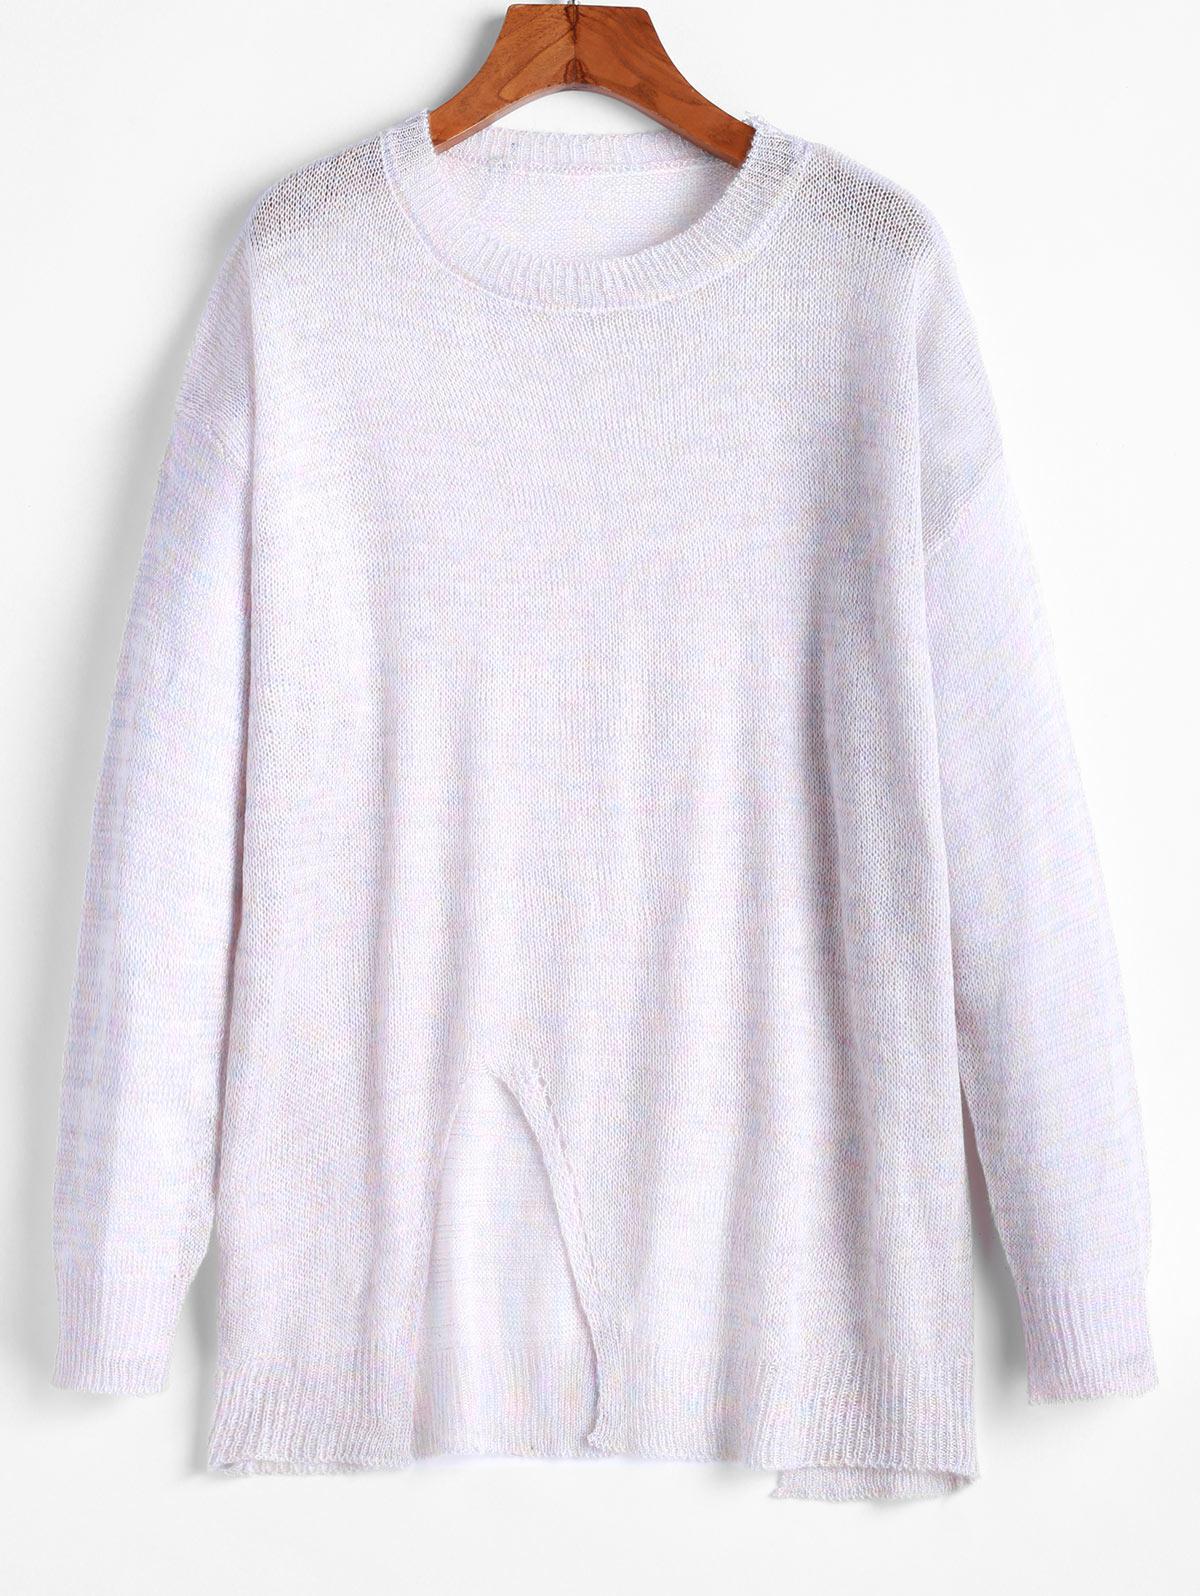 ZAFUL Metallic Thread Slit Drop Shoulder Tunic Sweater thumbnail